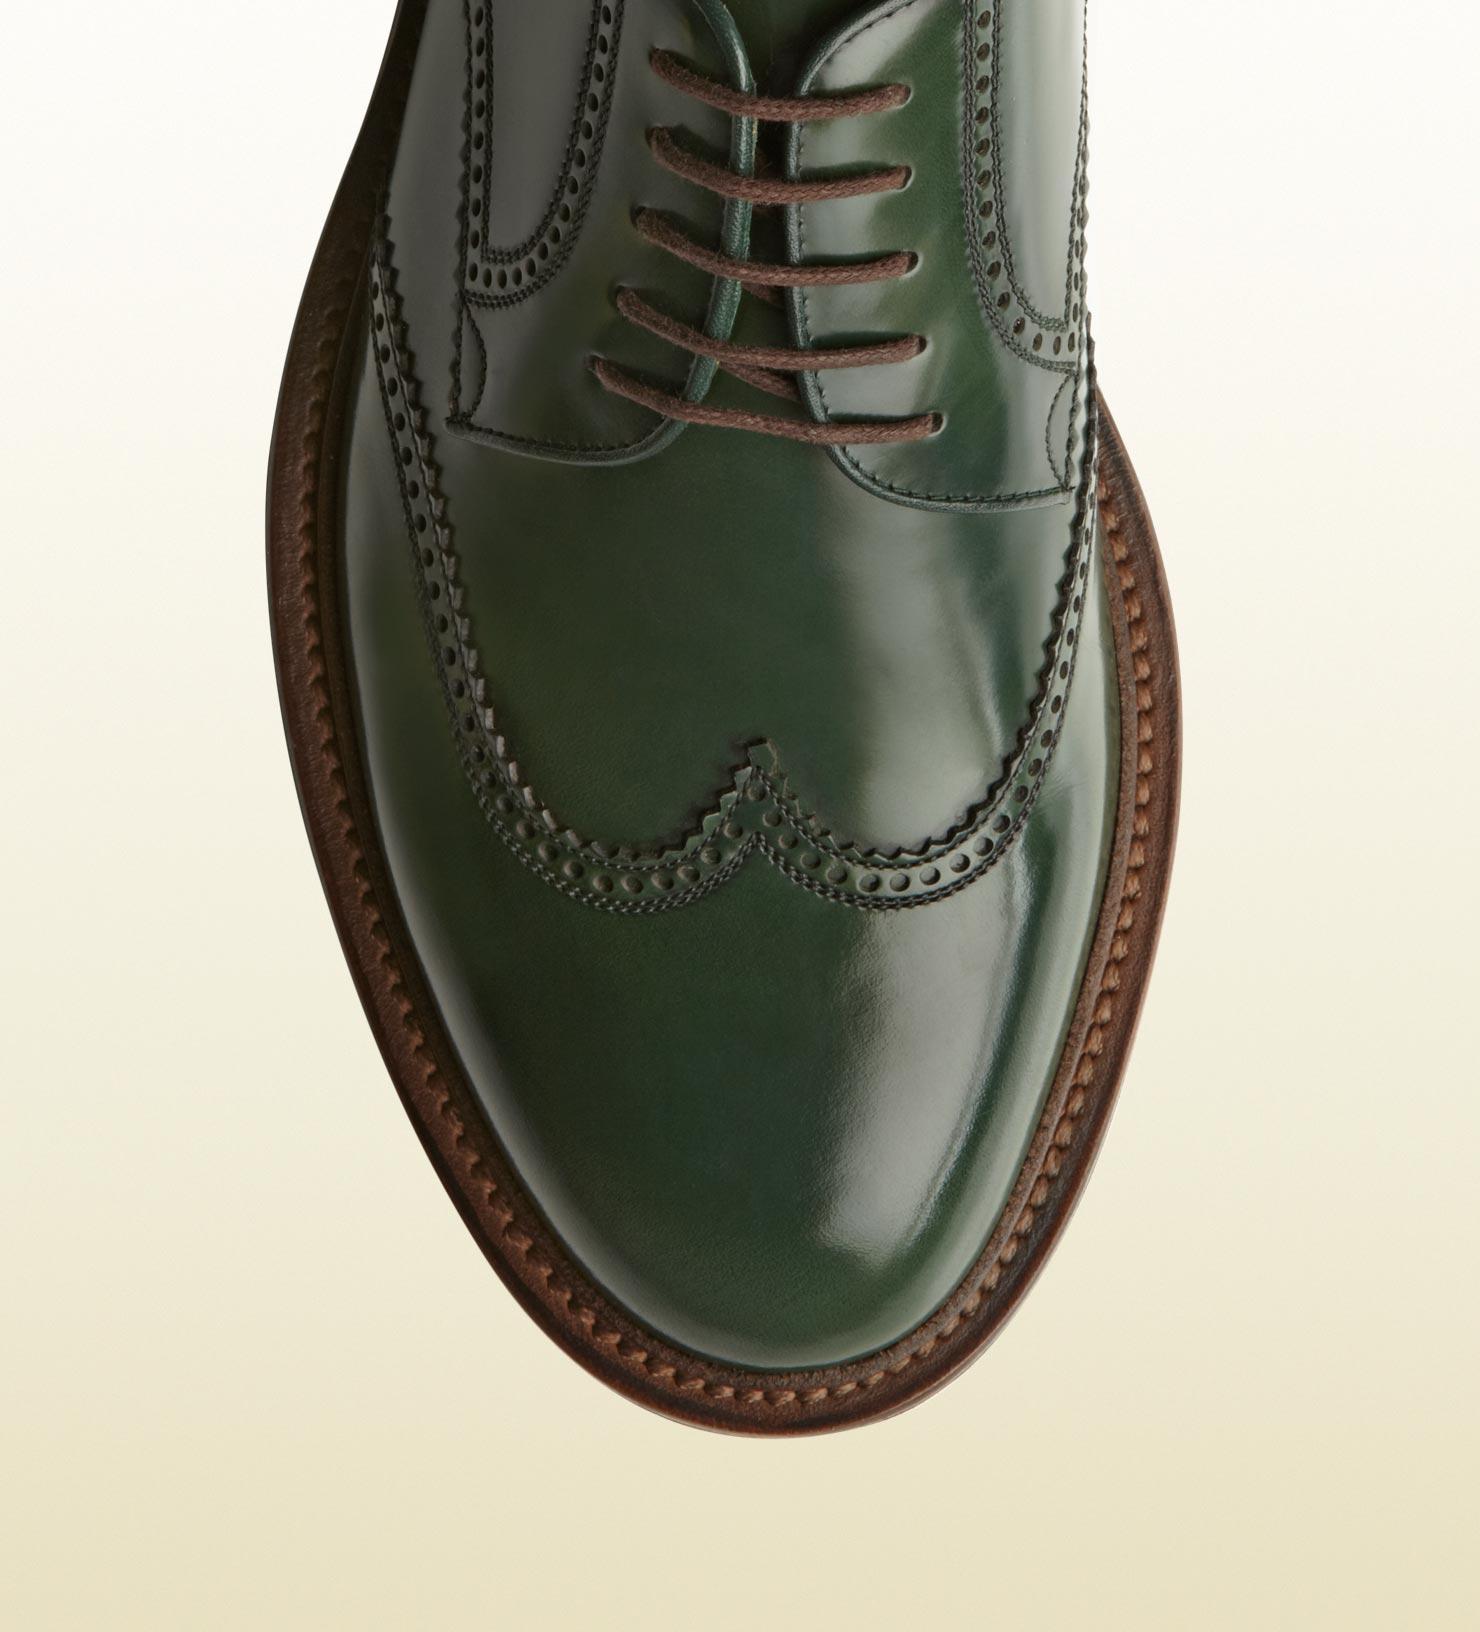 dbecc411e Gucci Laceup Brogue Shoe in Green for Men - Lyst